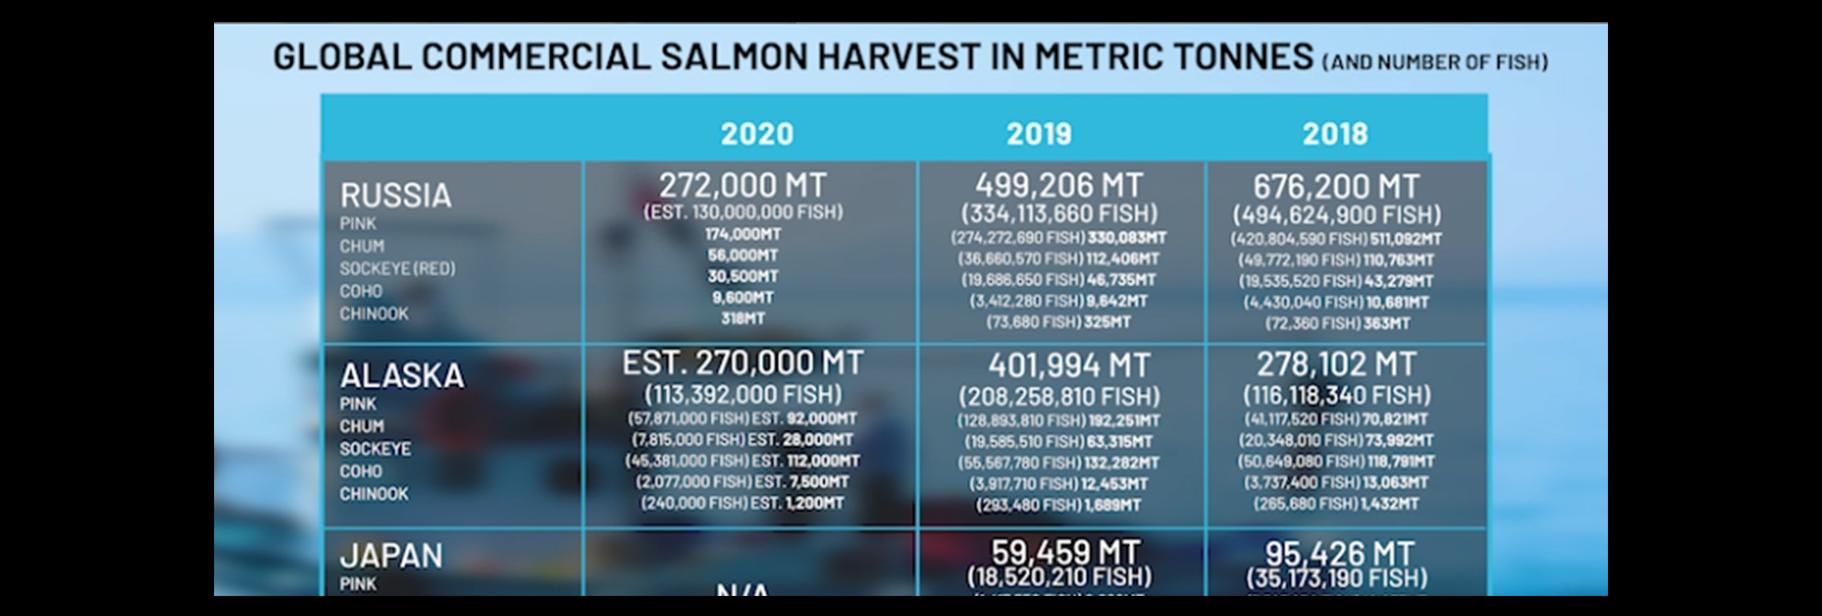 Global Salmon Harvest